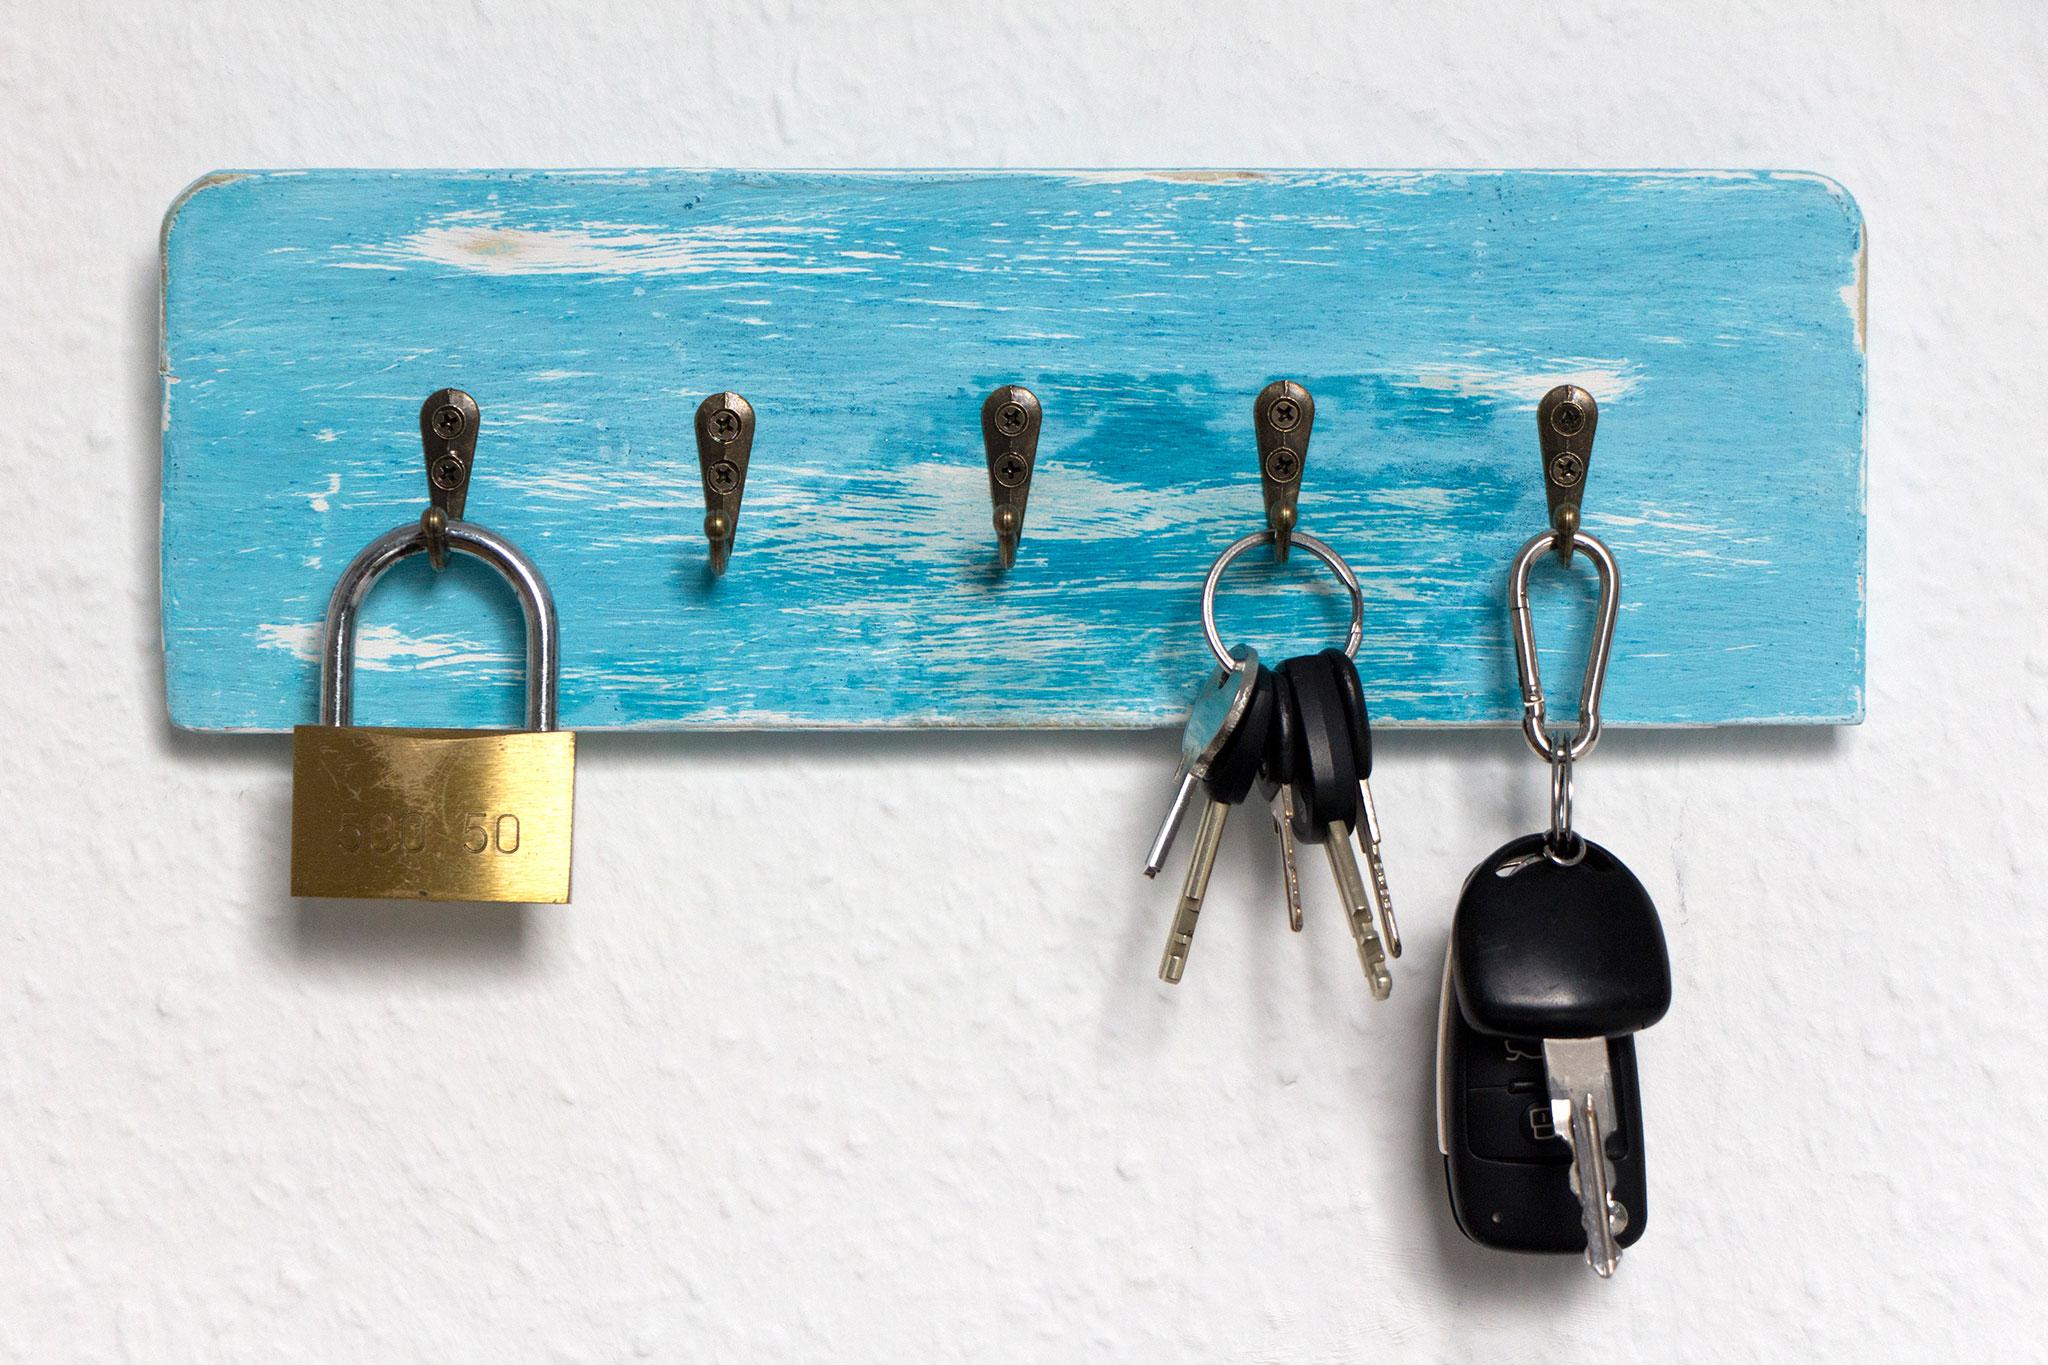 Schlüsselbrett im Vintage-Stil, Türkis, upcycled